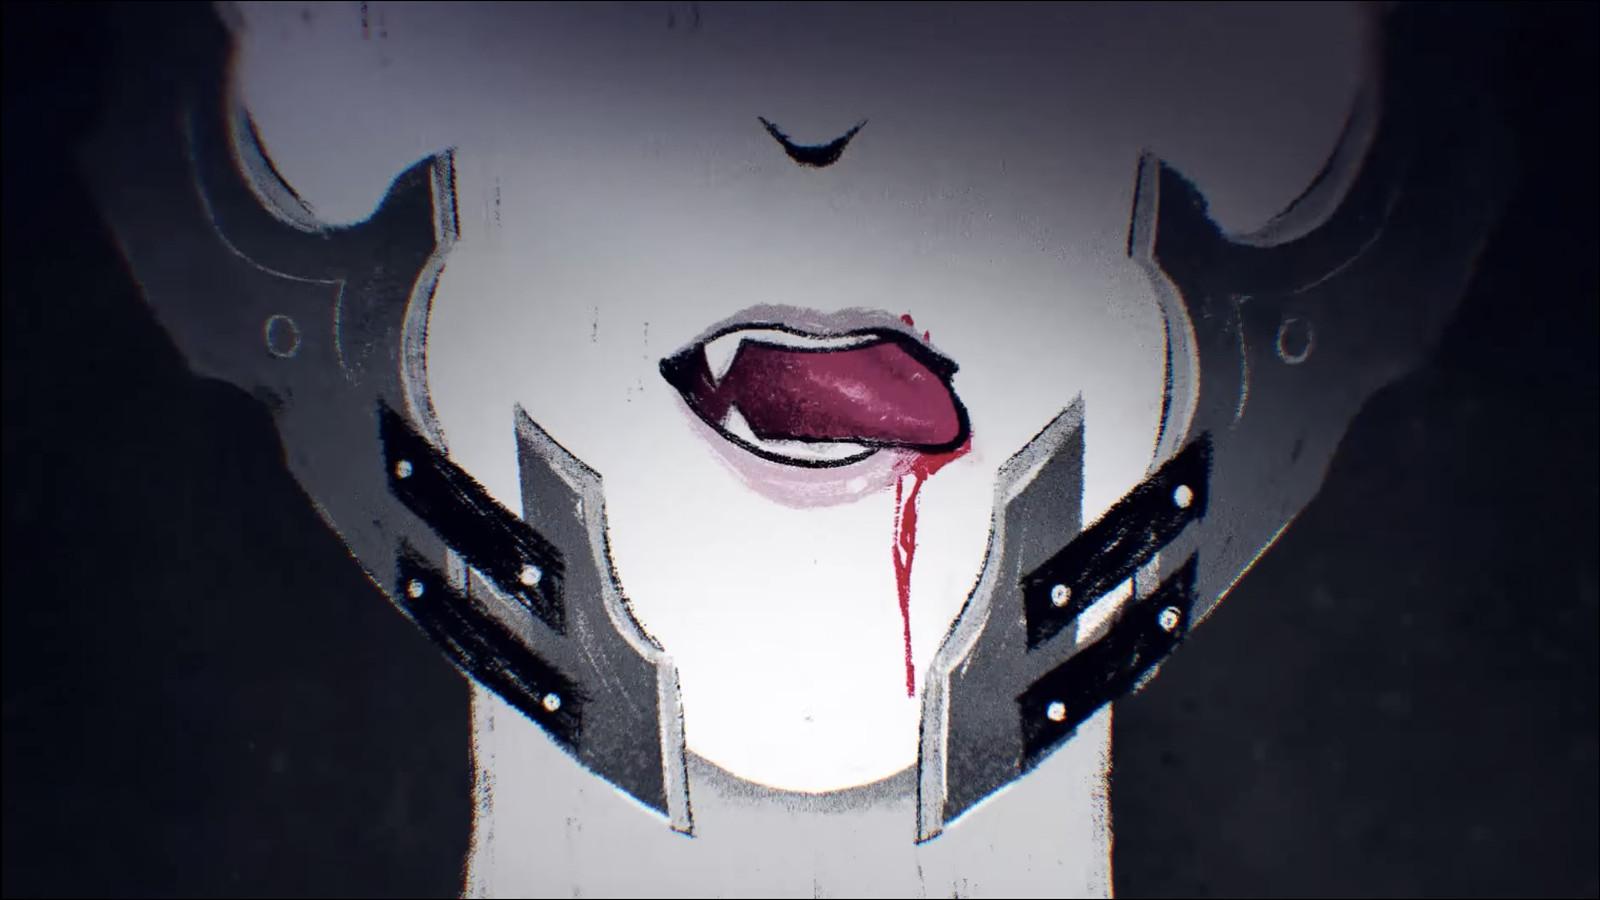 Code Vein is a hardcore, vampire RPG from Bandai Namco